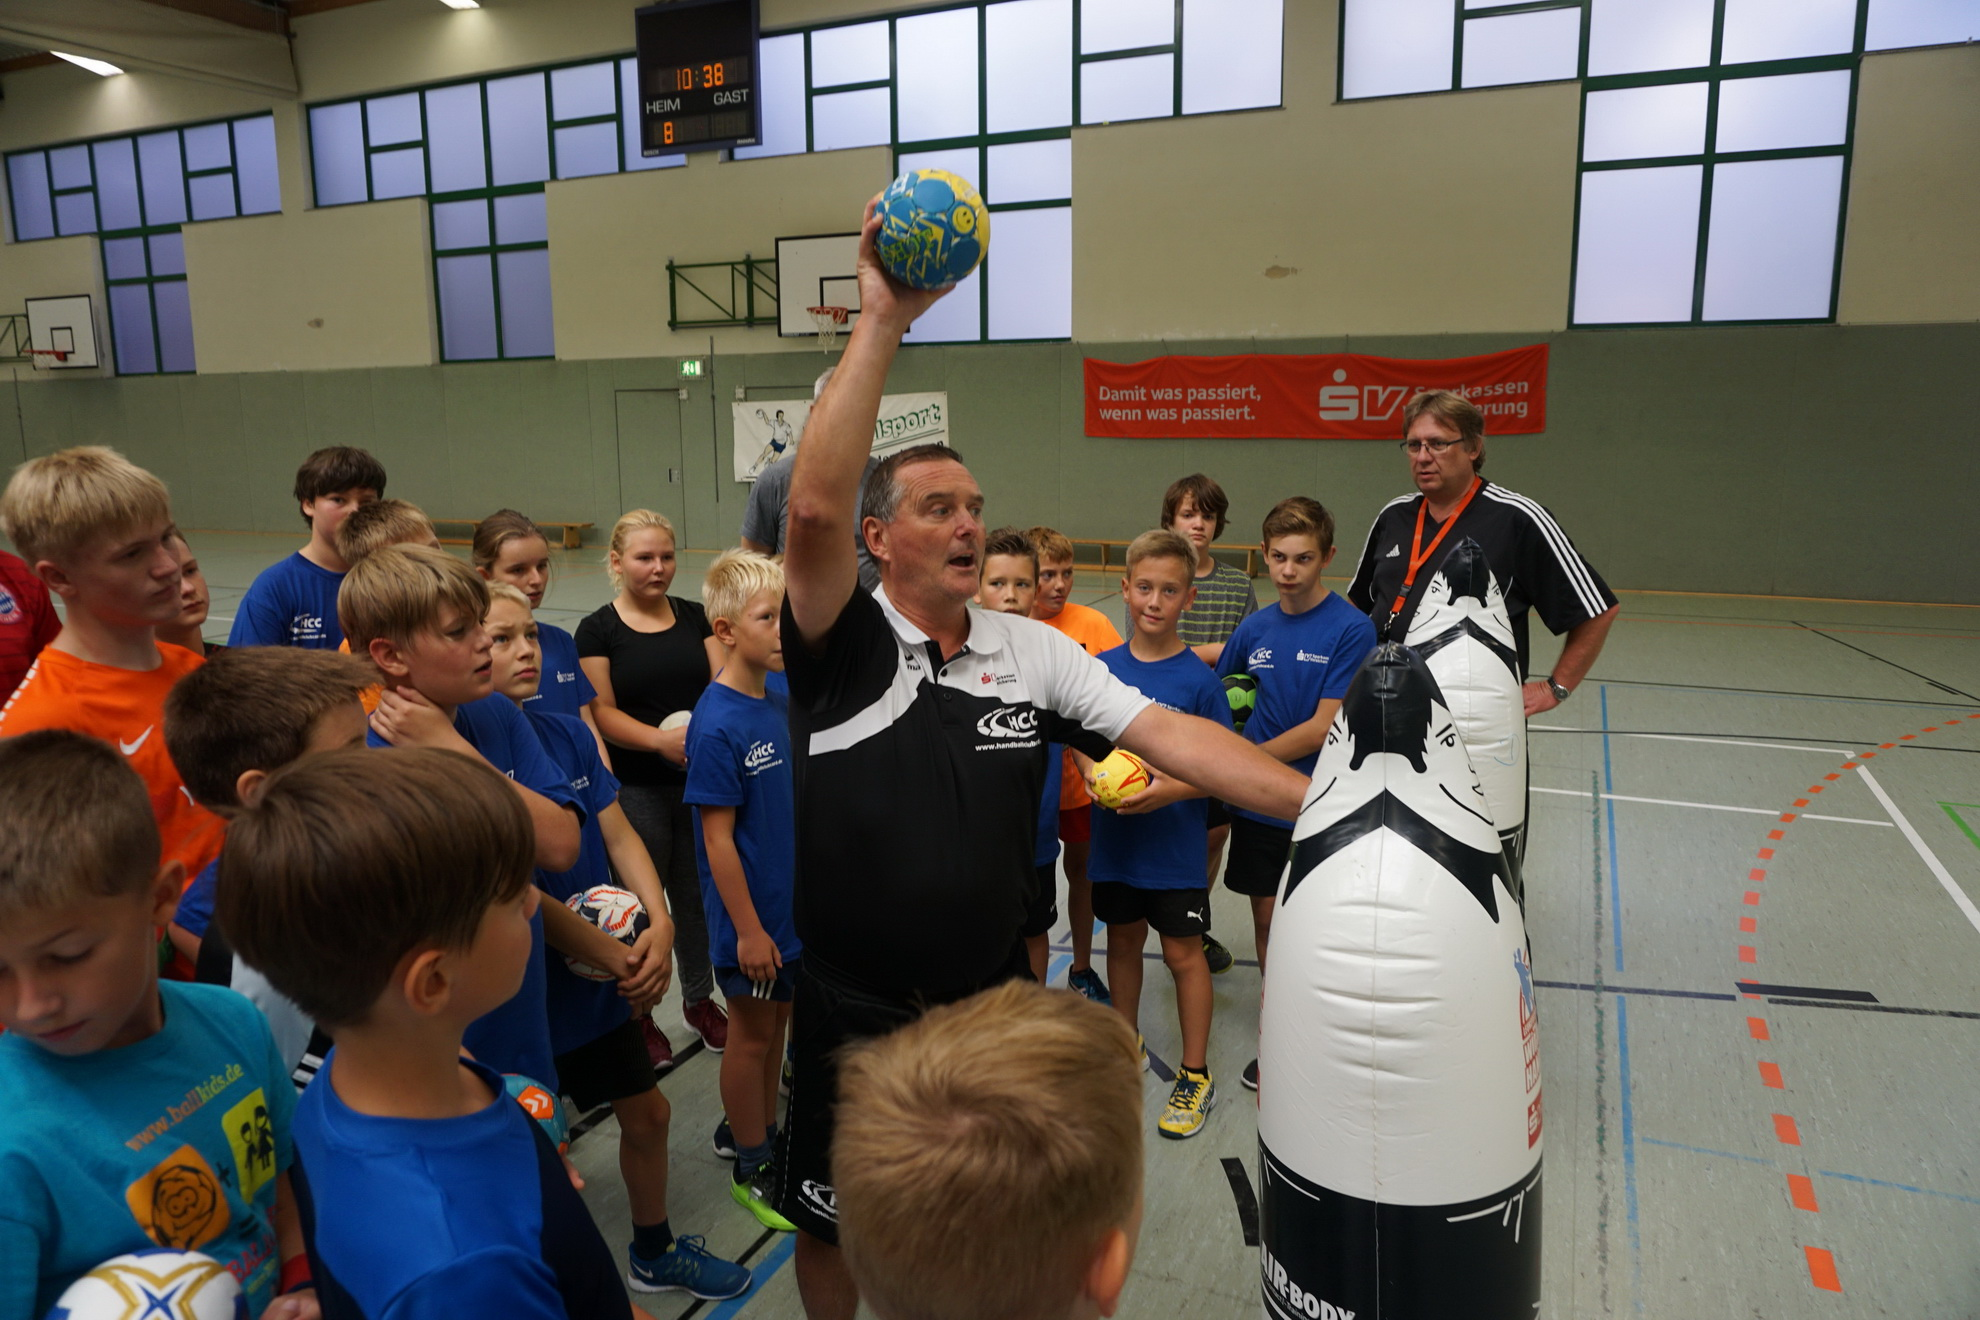 201808_Handballcamp_SDH_MG_196w